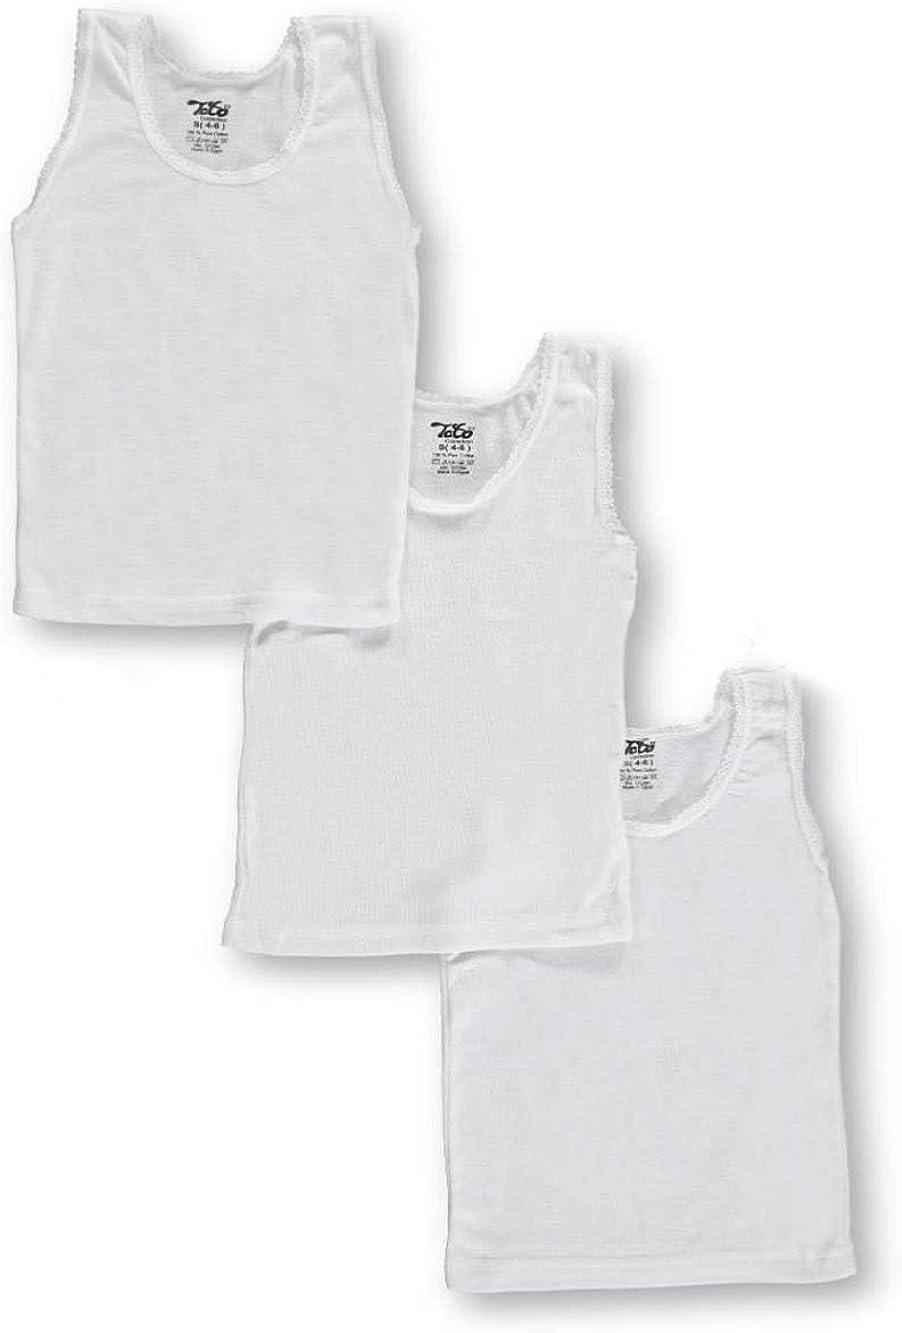 TATO Little Girls 3-Pack Camisoles